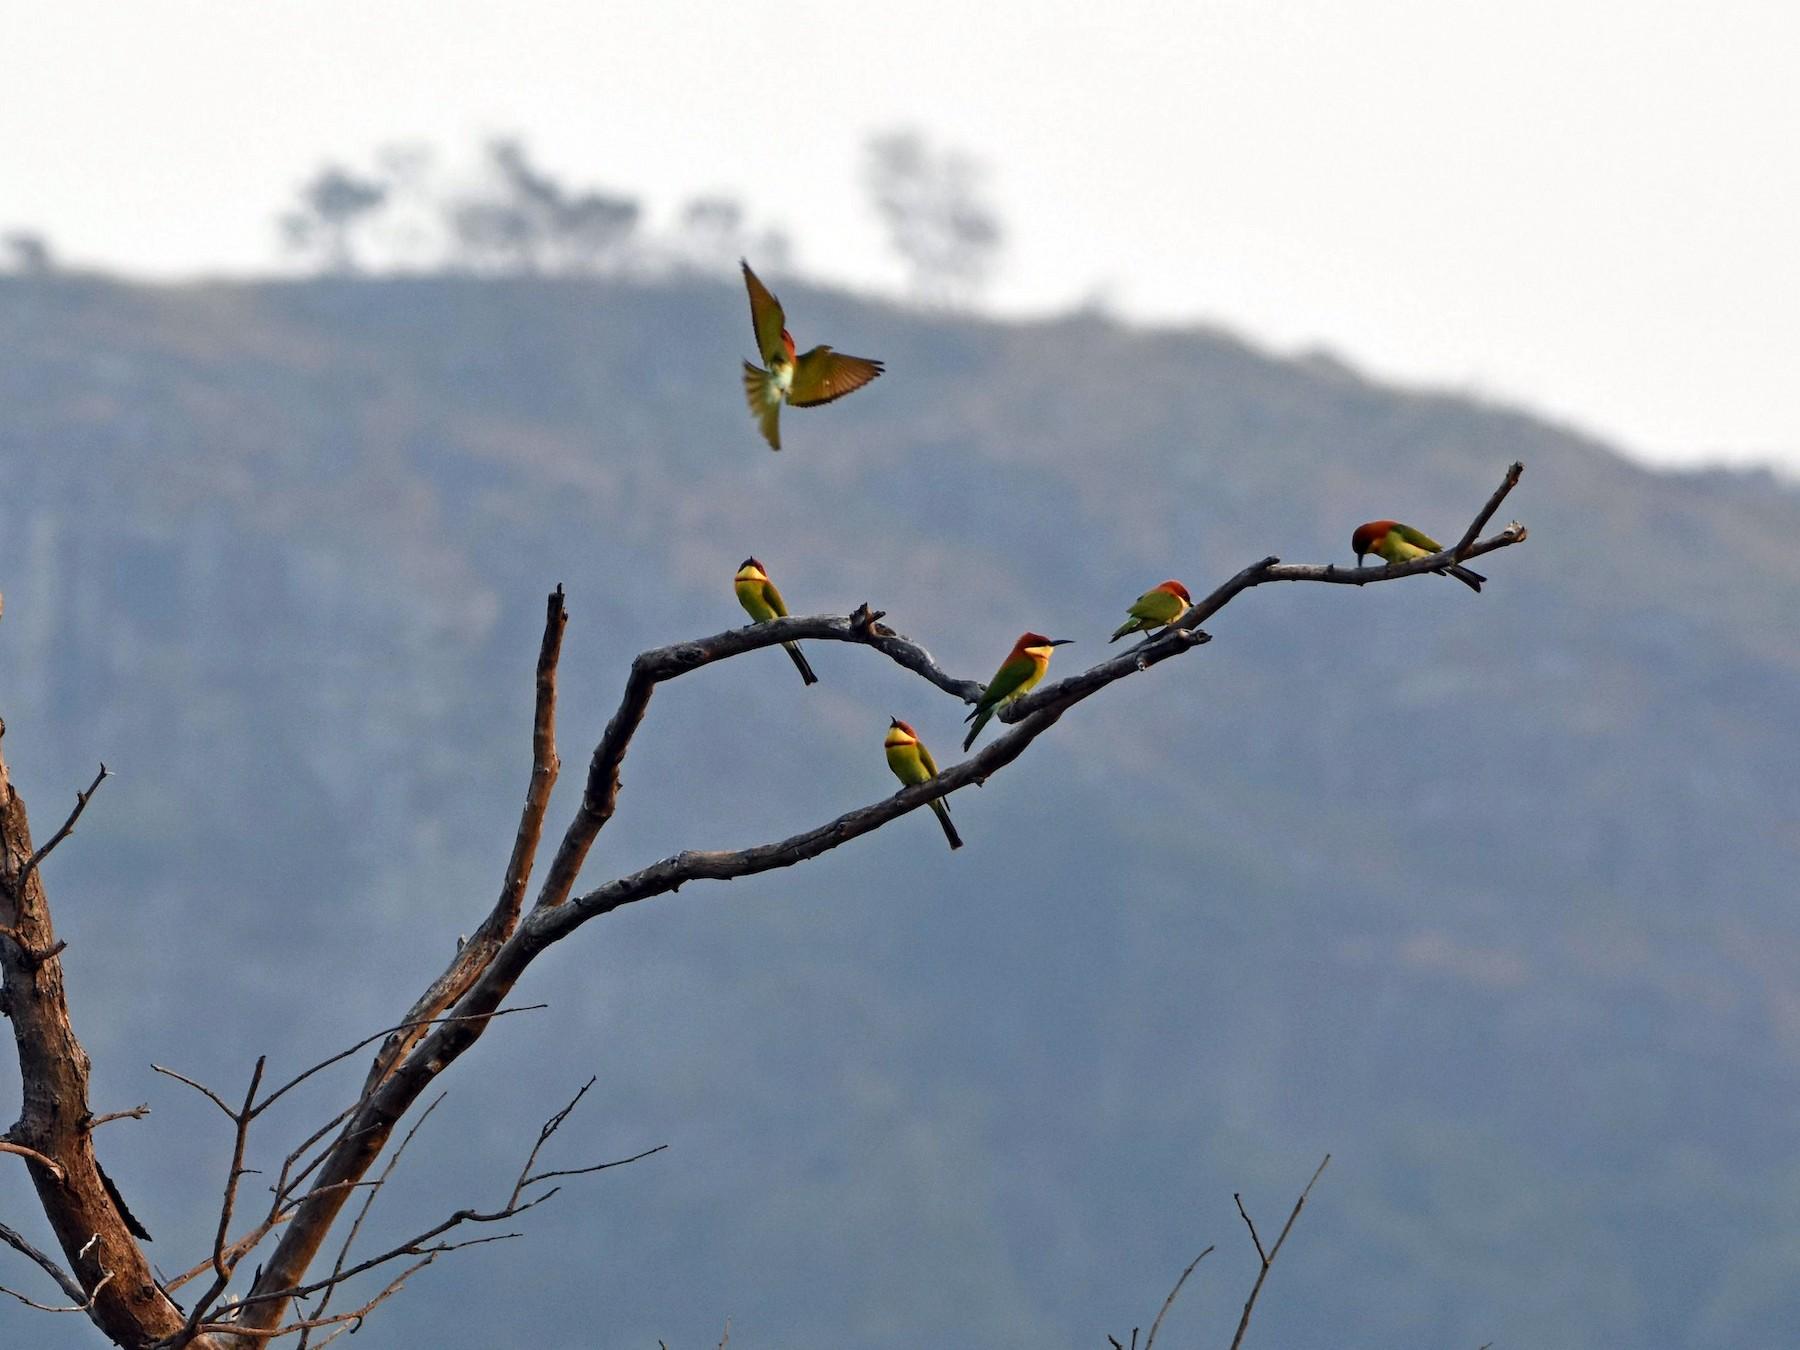 Chestnut-headed Bee-eater - Rajesh Radhakrishnan